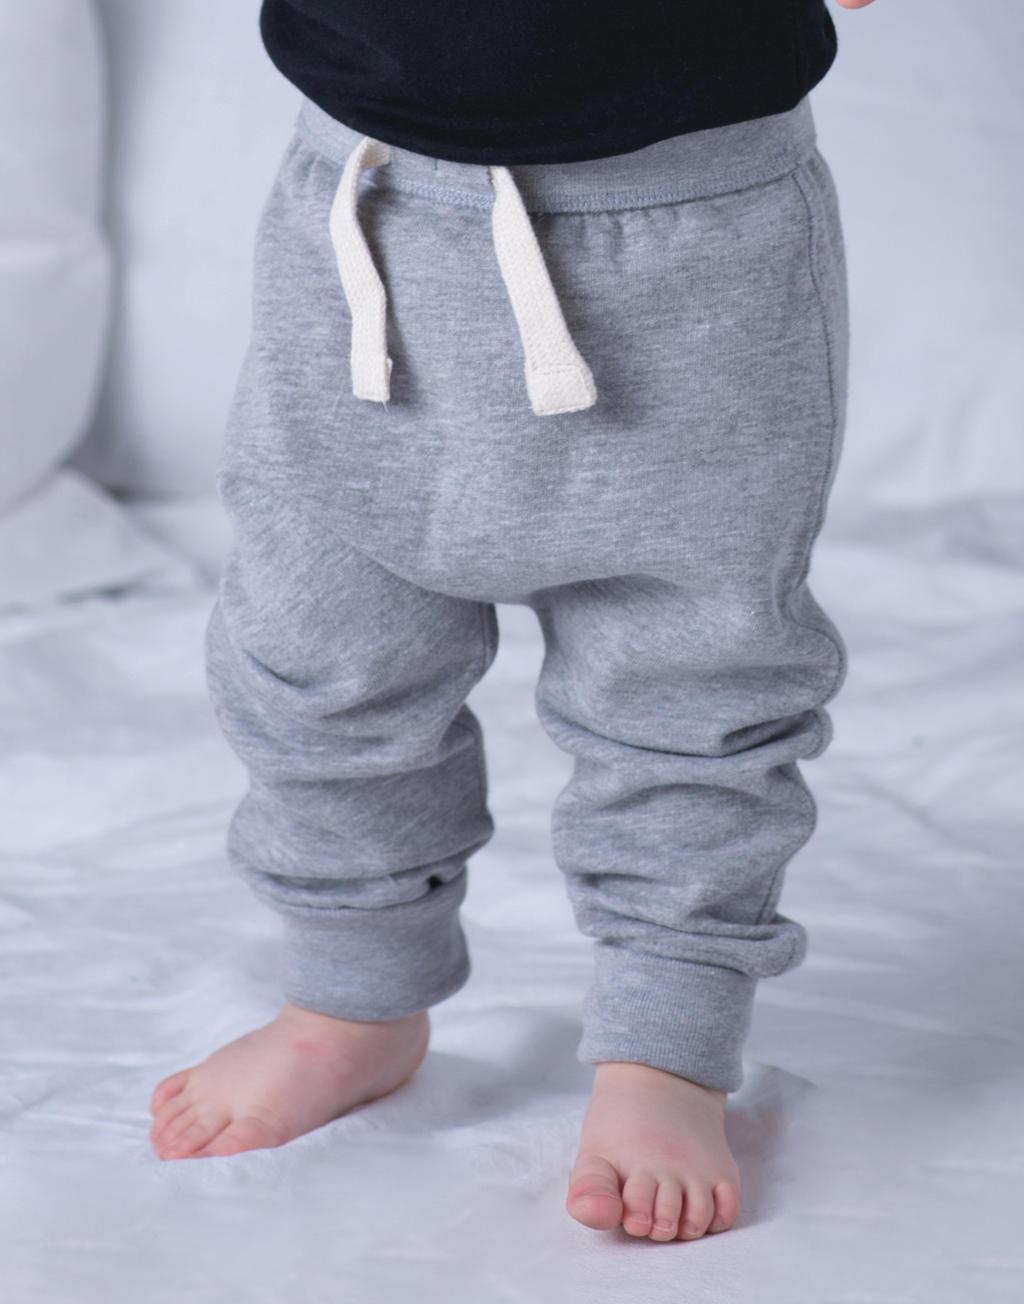 b25467d9b5a0e Pantalons de jogging personnalisable   Pantalon de jogging Bébé ...